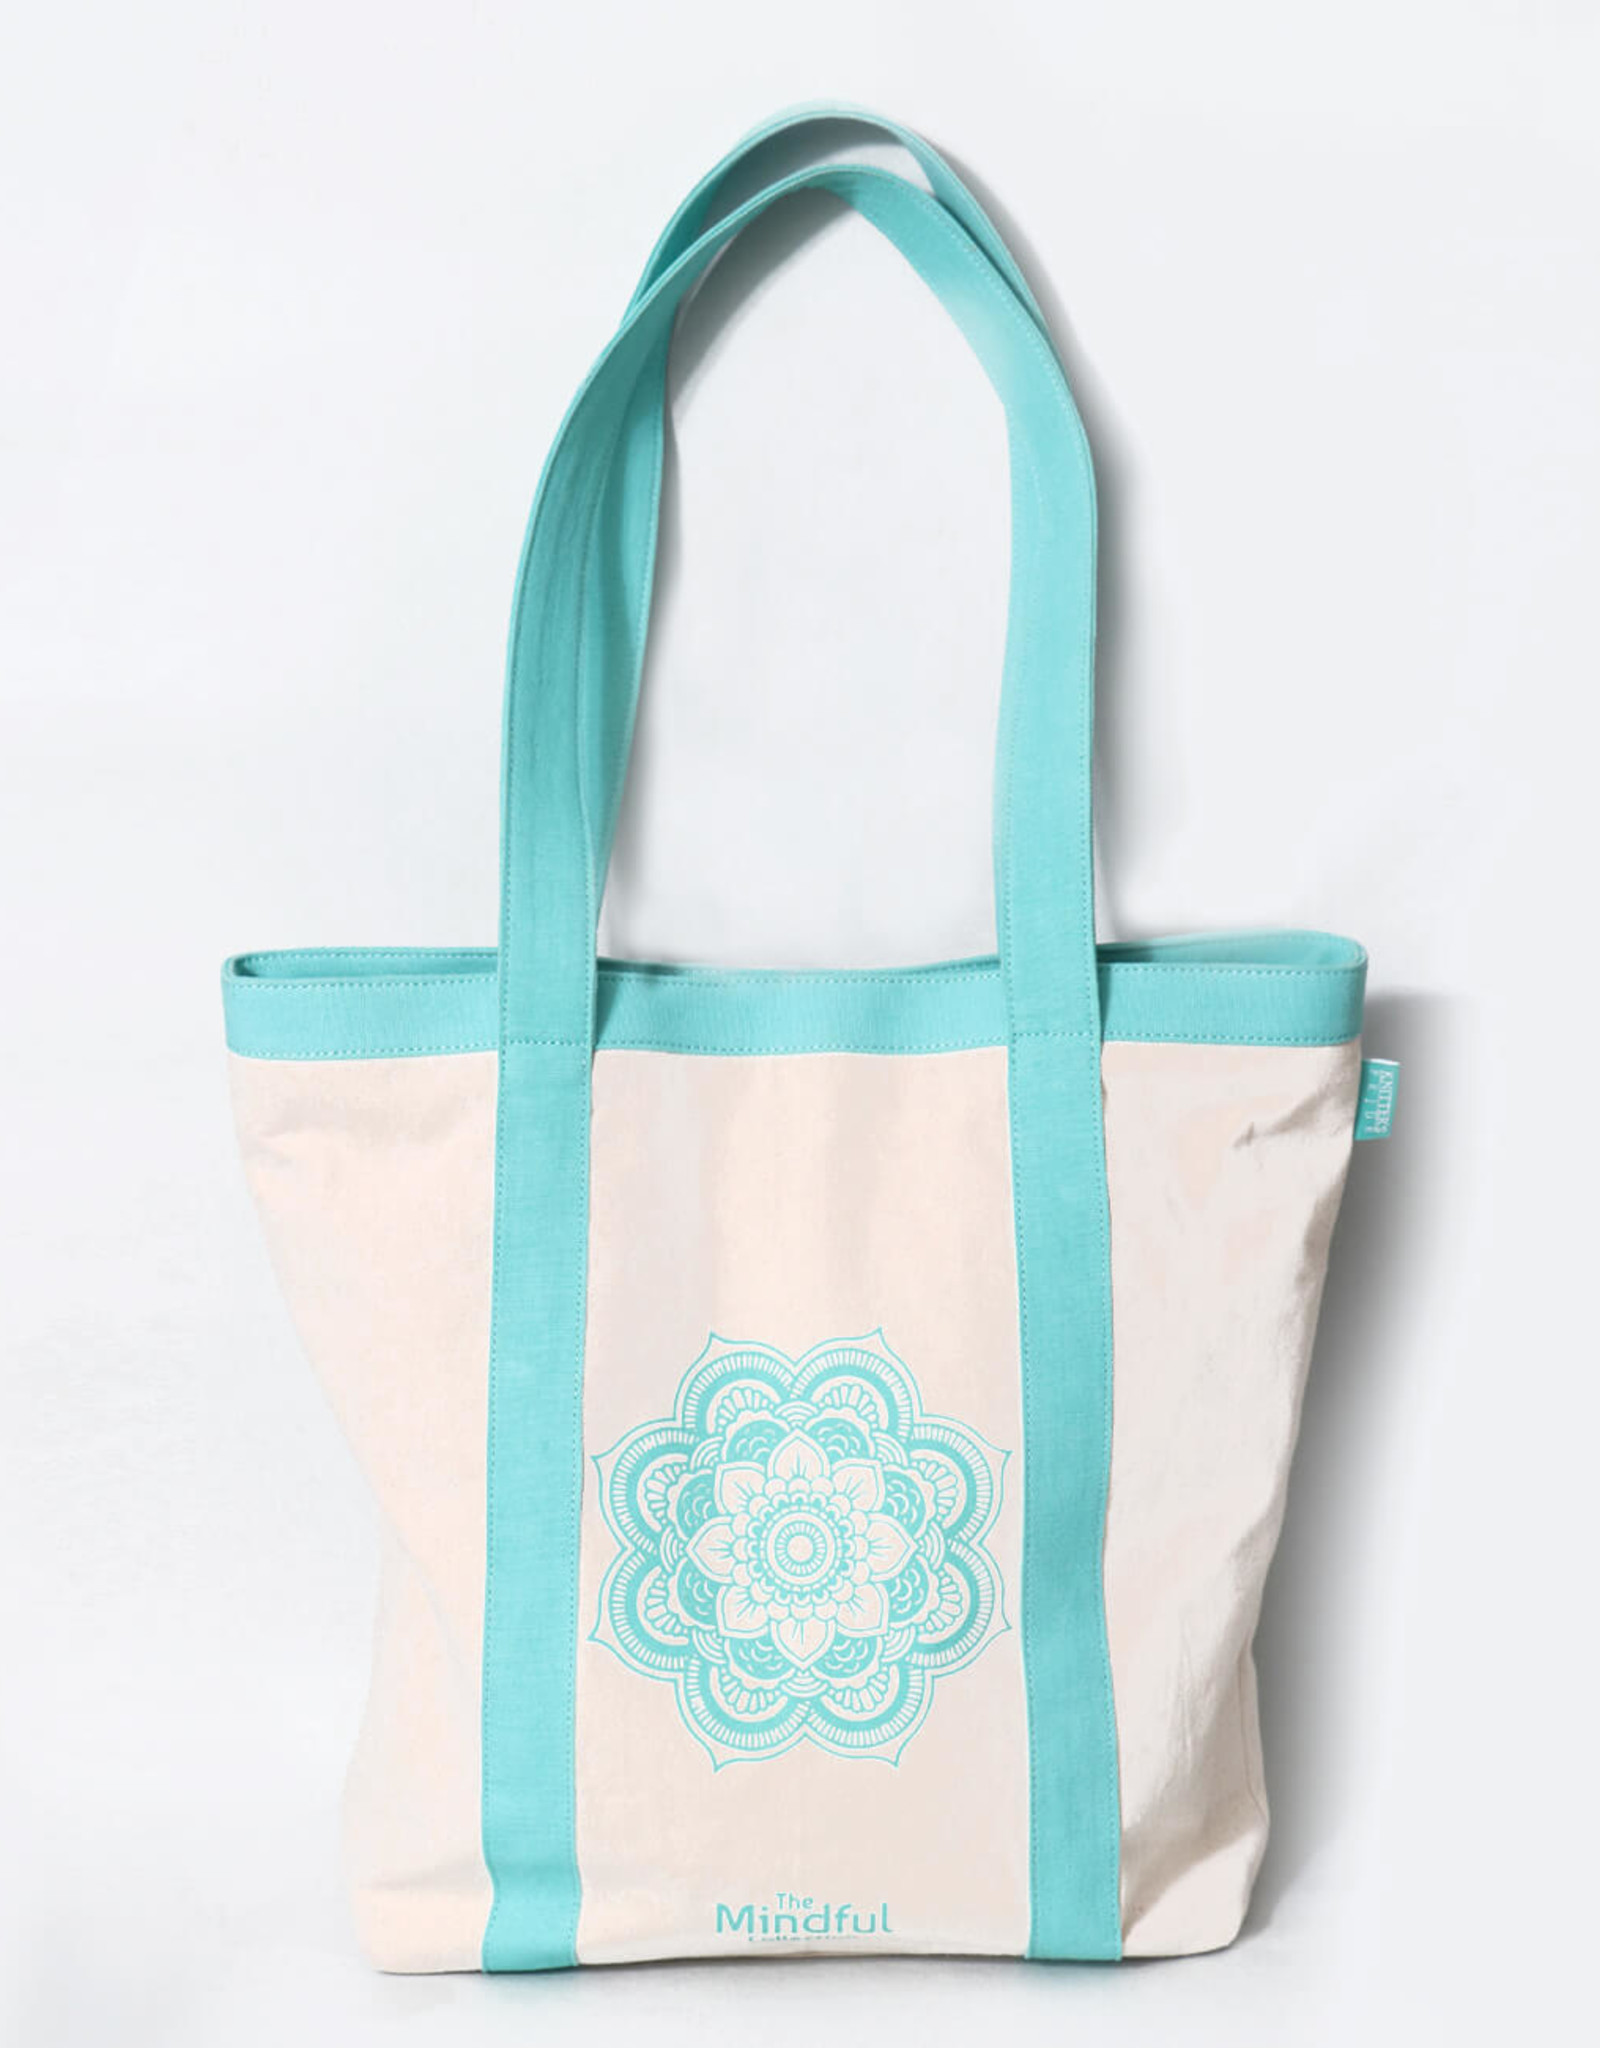 Knitters Pride Mindful Tote Bag